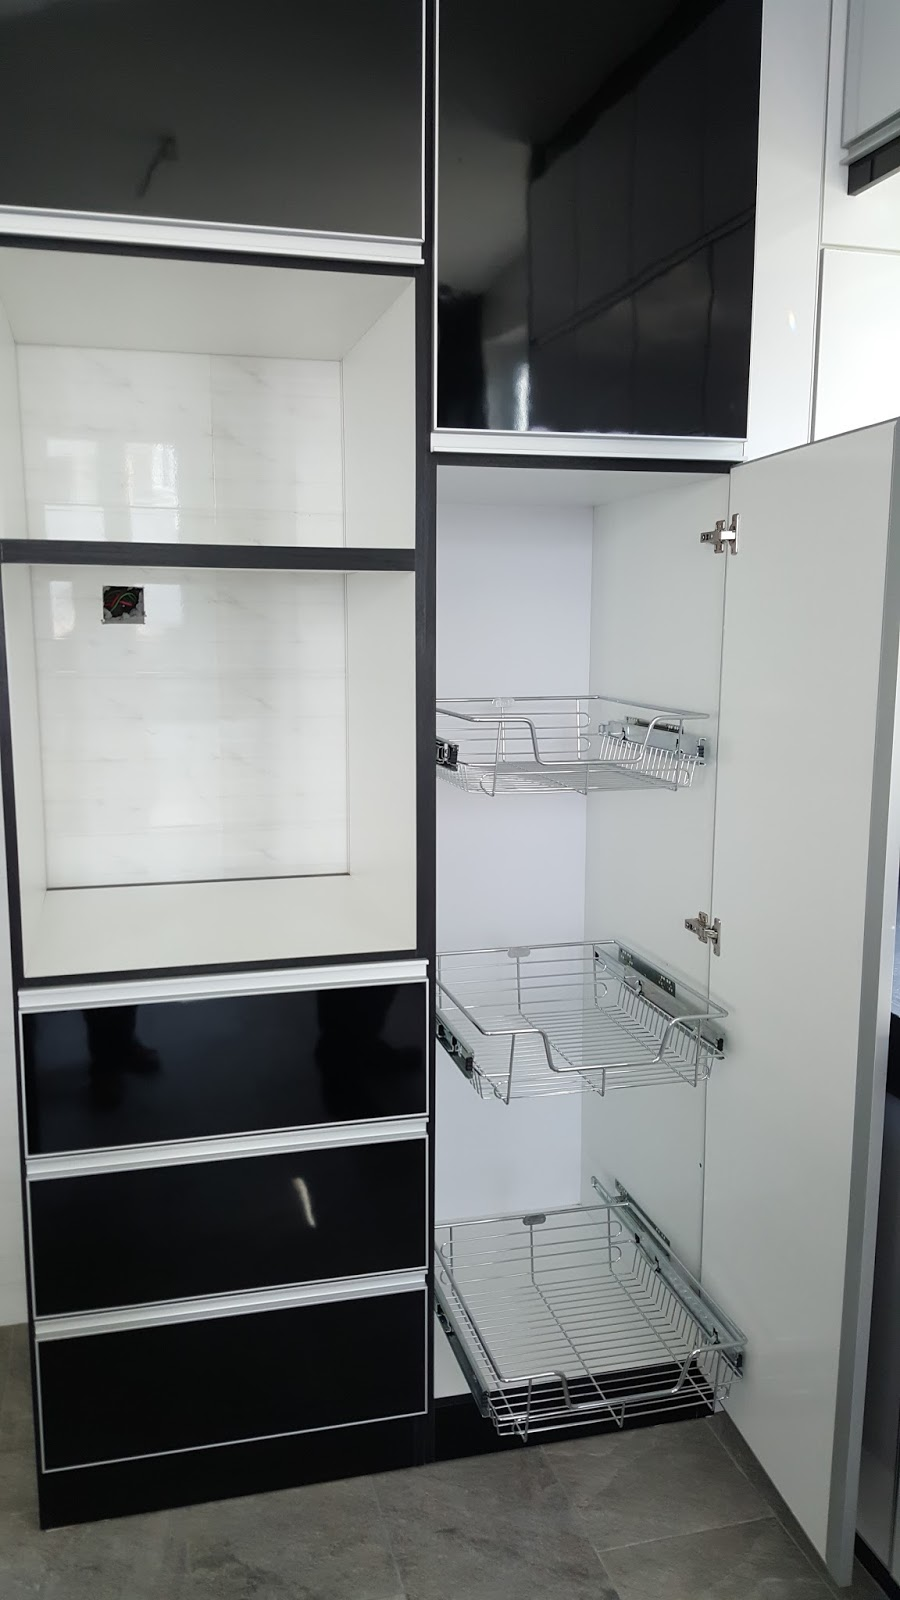 Kitchen cabinet farroda april 2016 for Kitchen cabinet murah 2016